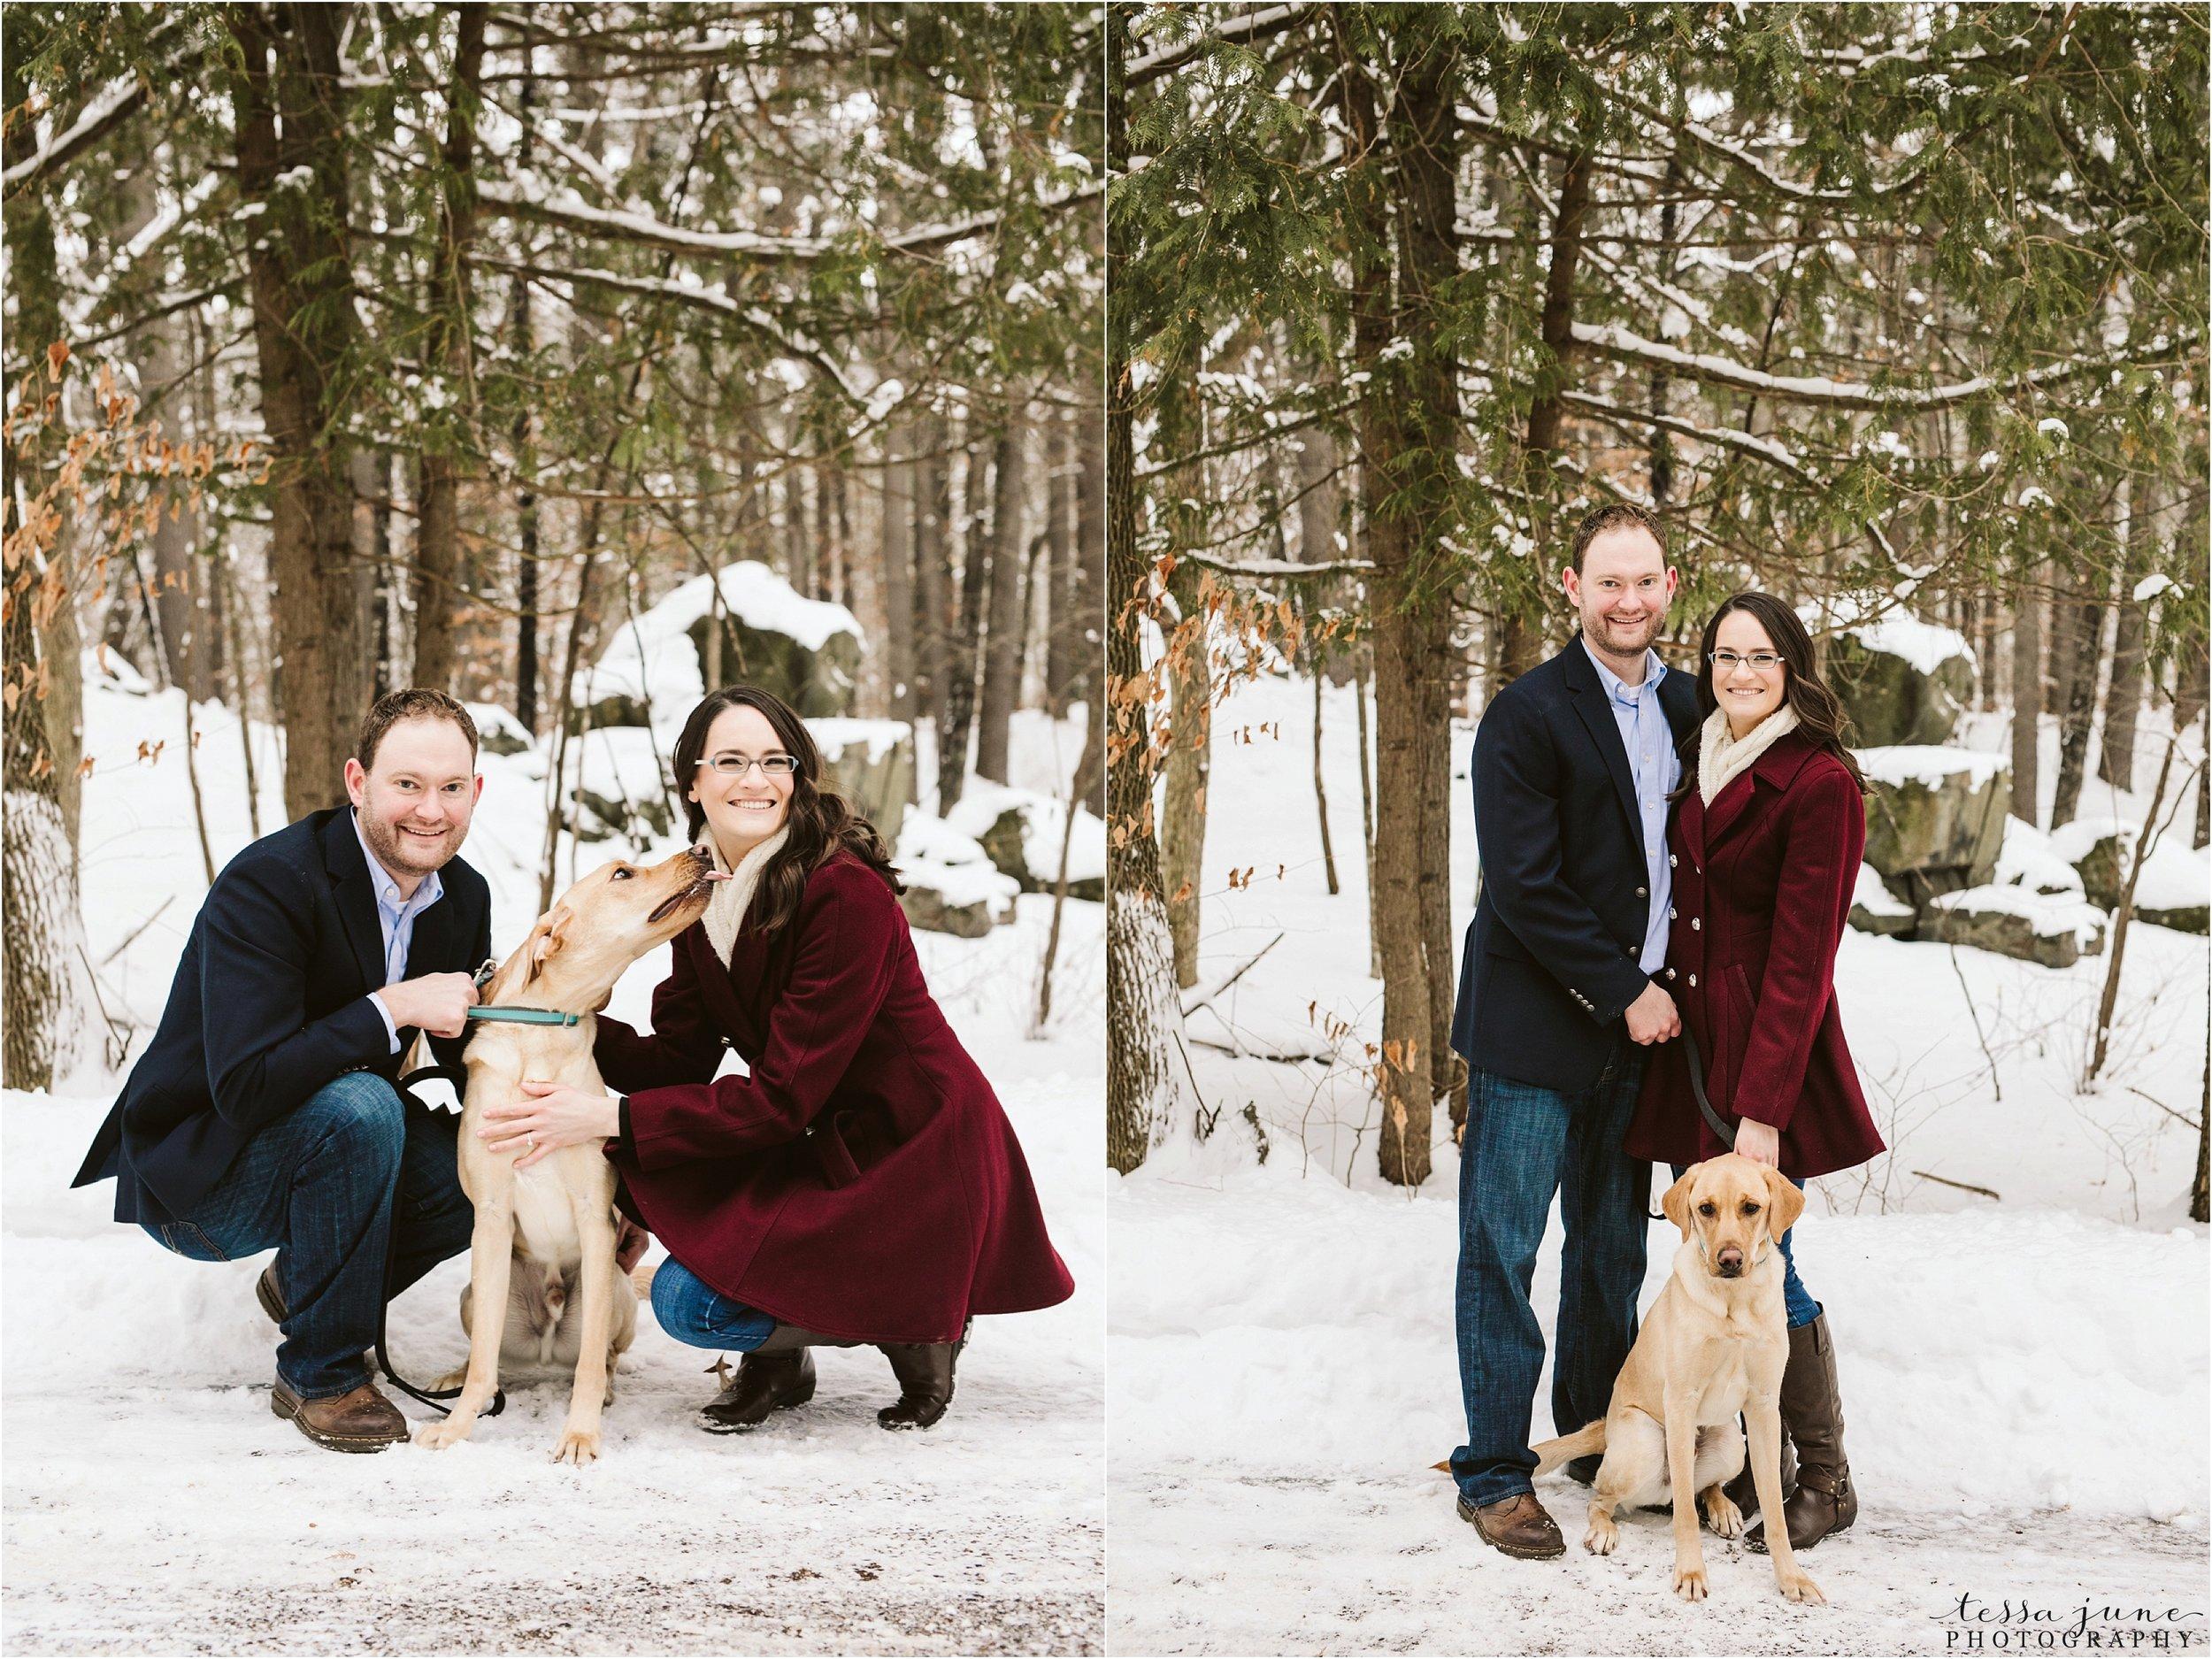 taylors-falls-winter-engagement-session-st-cloud-photographer-16.jpg